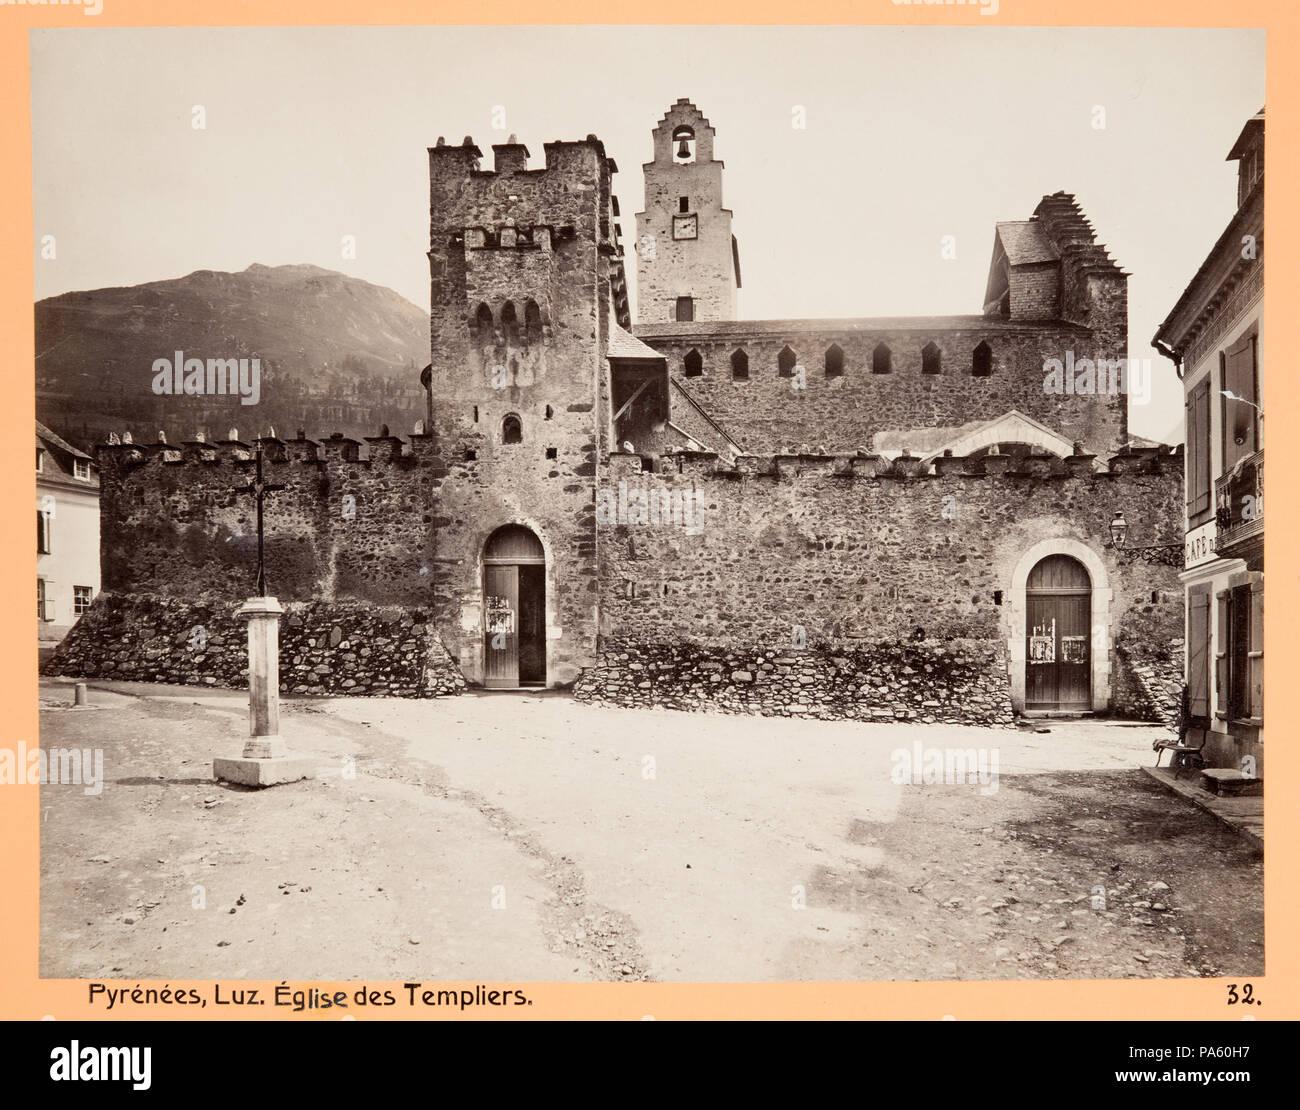 Inv.nr:LXVI:D.32. 87 Fotografi av Pyrénées. Luz, Èglise des Templiers - Hallwylska museet - 104663 - Stock Image